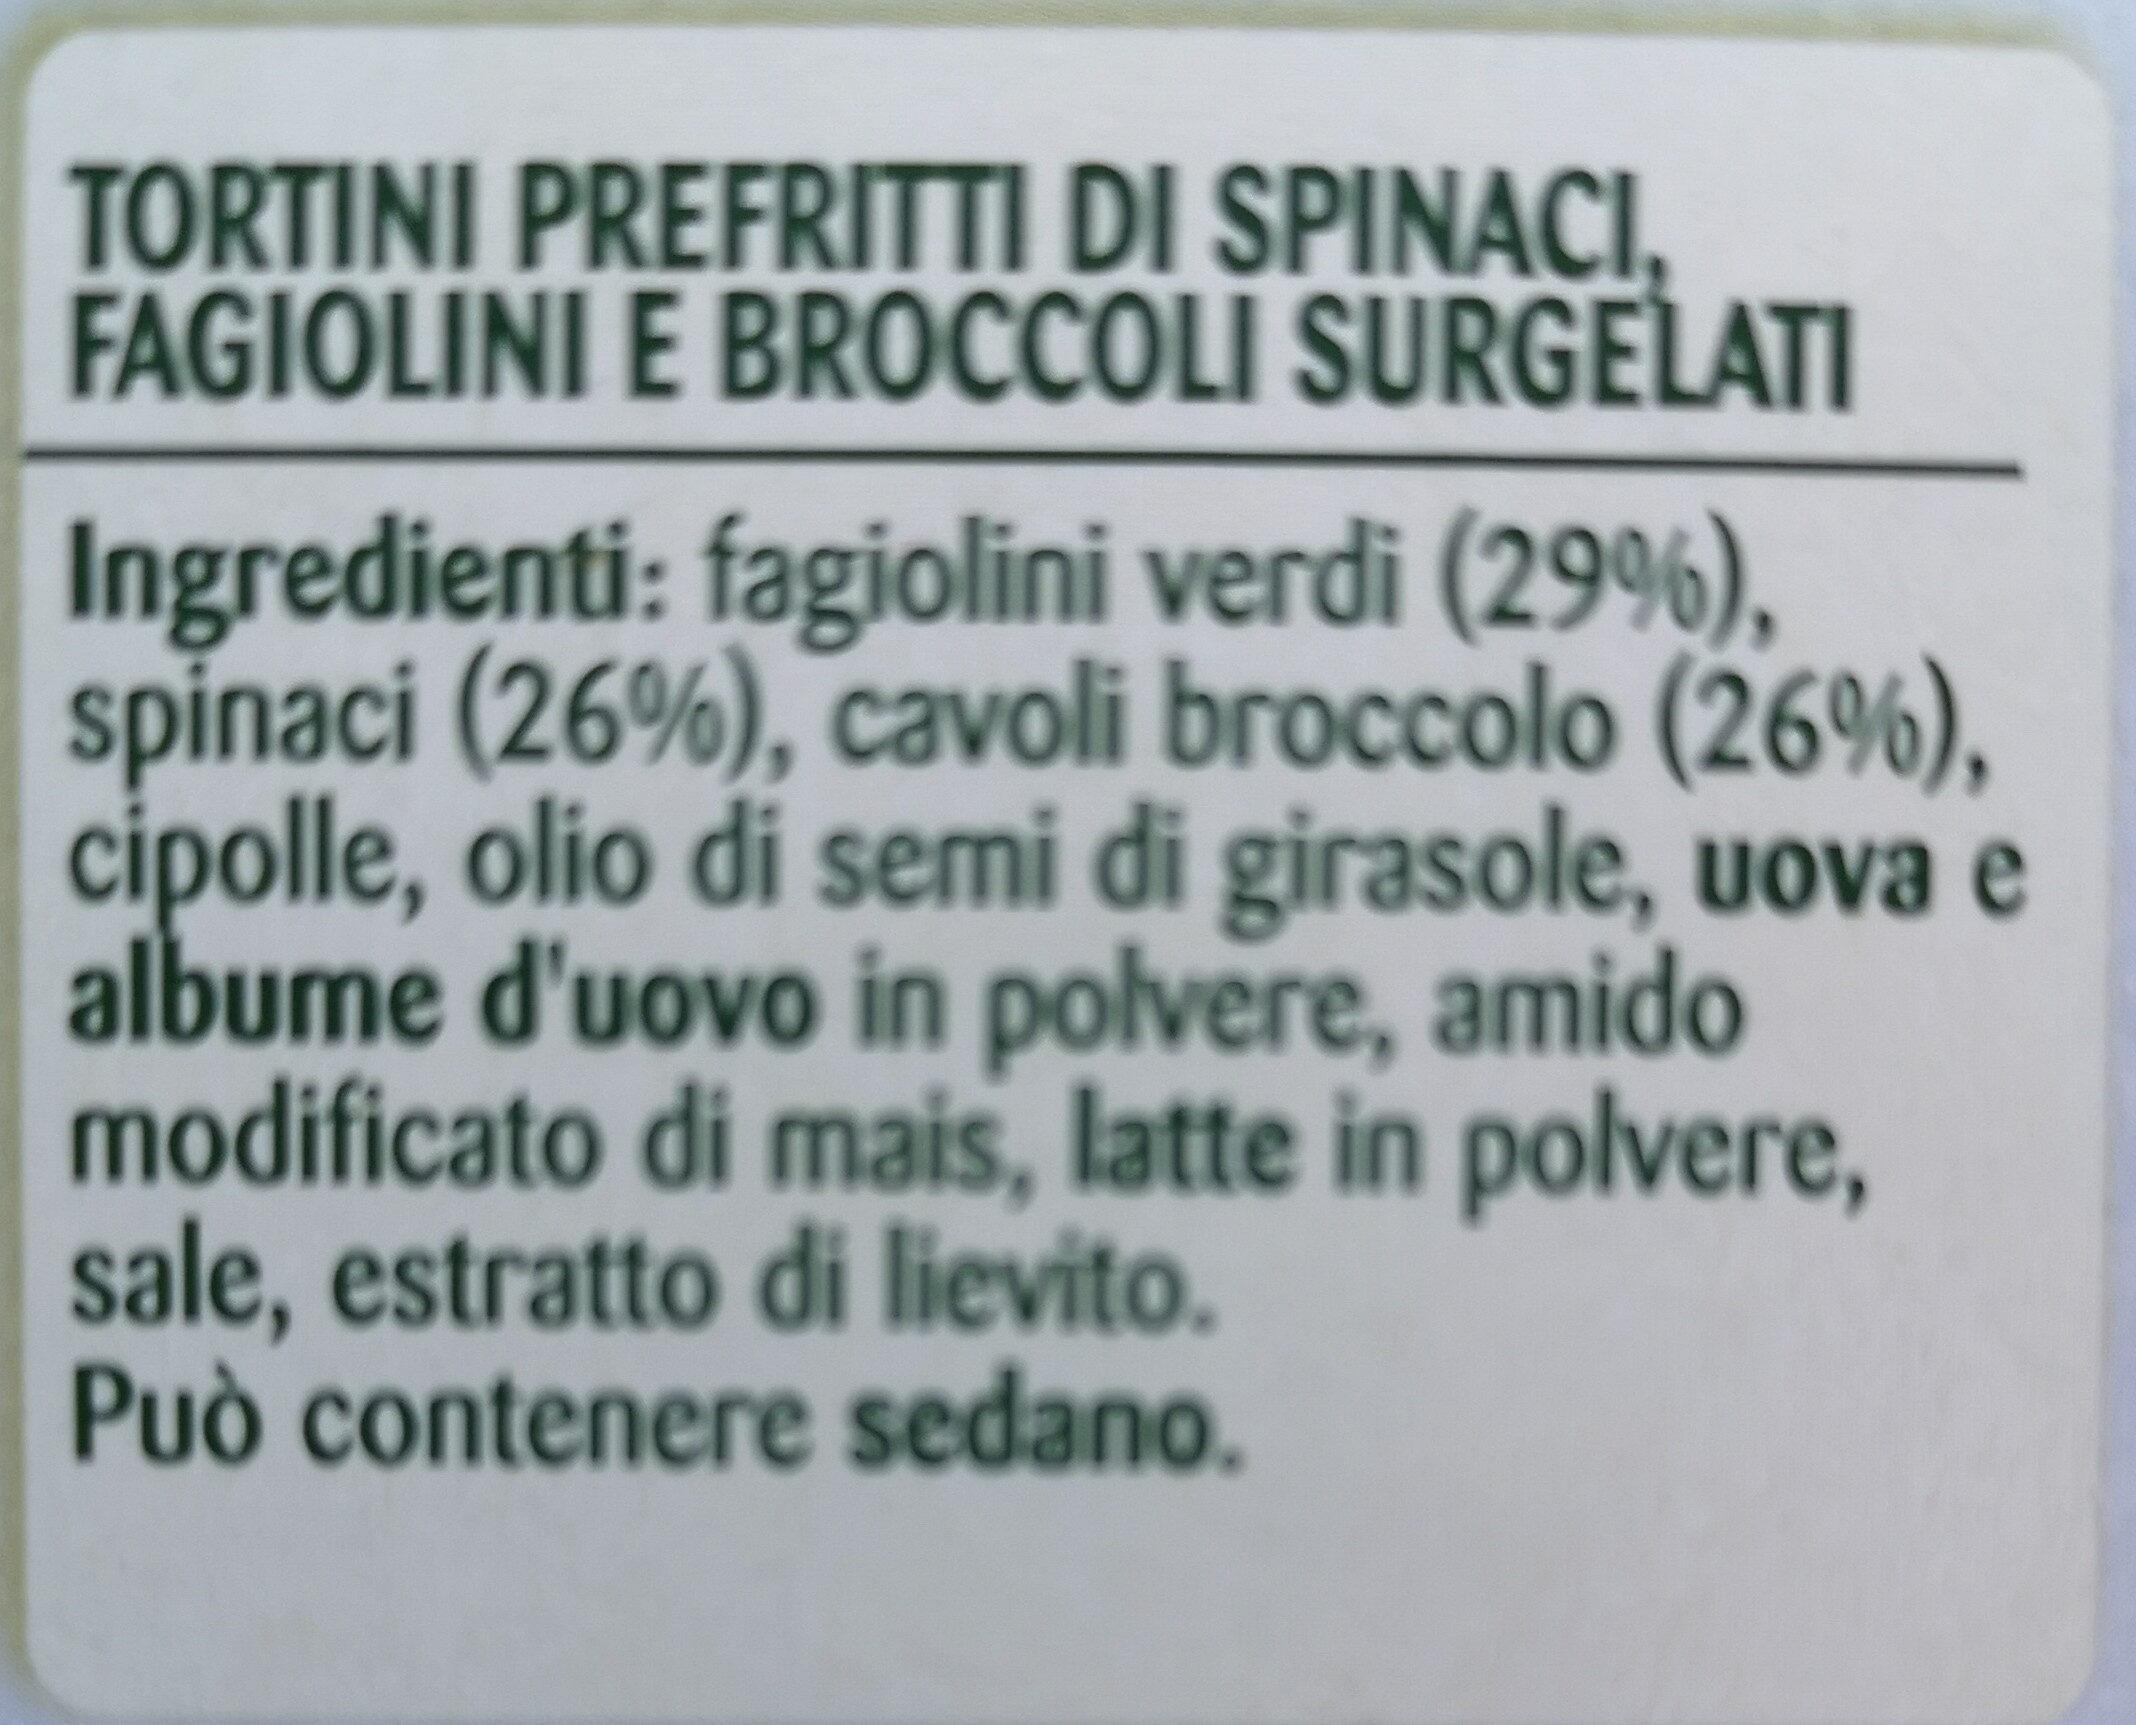 Coccole Tortini Spinaci Fagiolini Broccoli - Ingredients - it